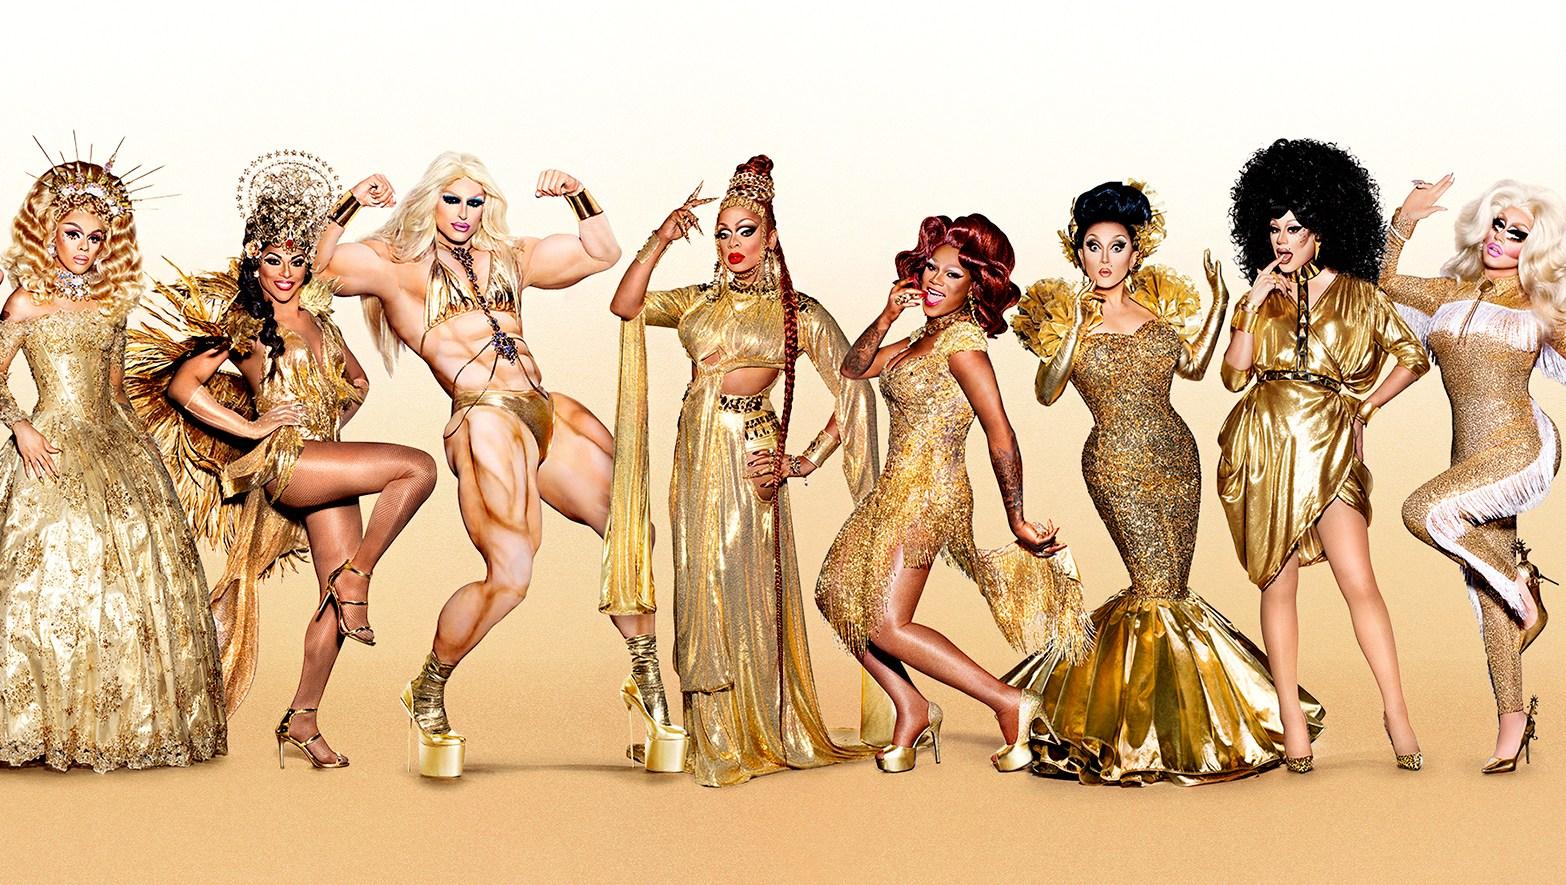 'RuPaul's Drag Race All Stars 3' cast